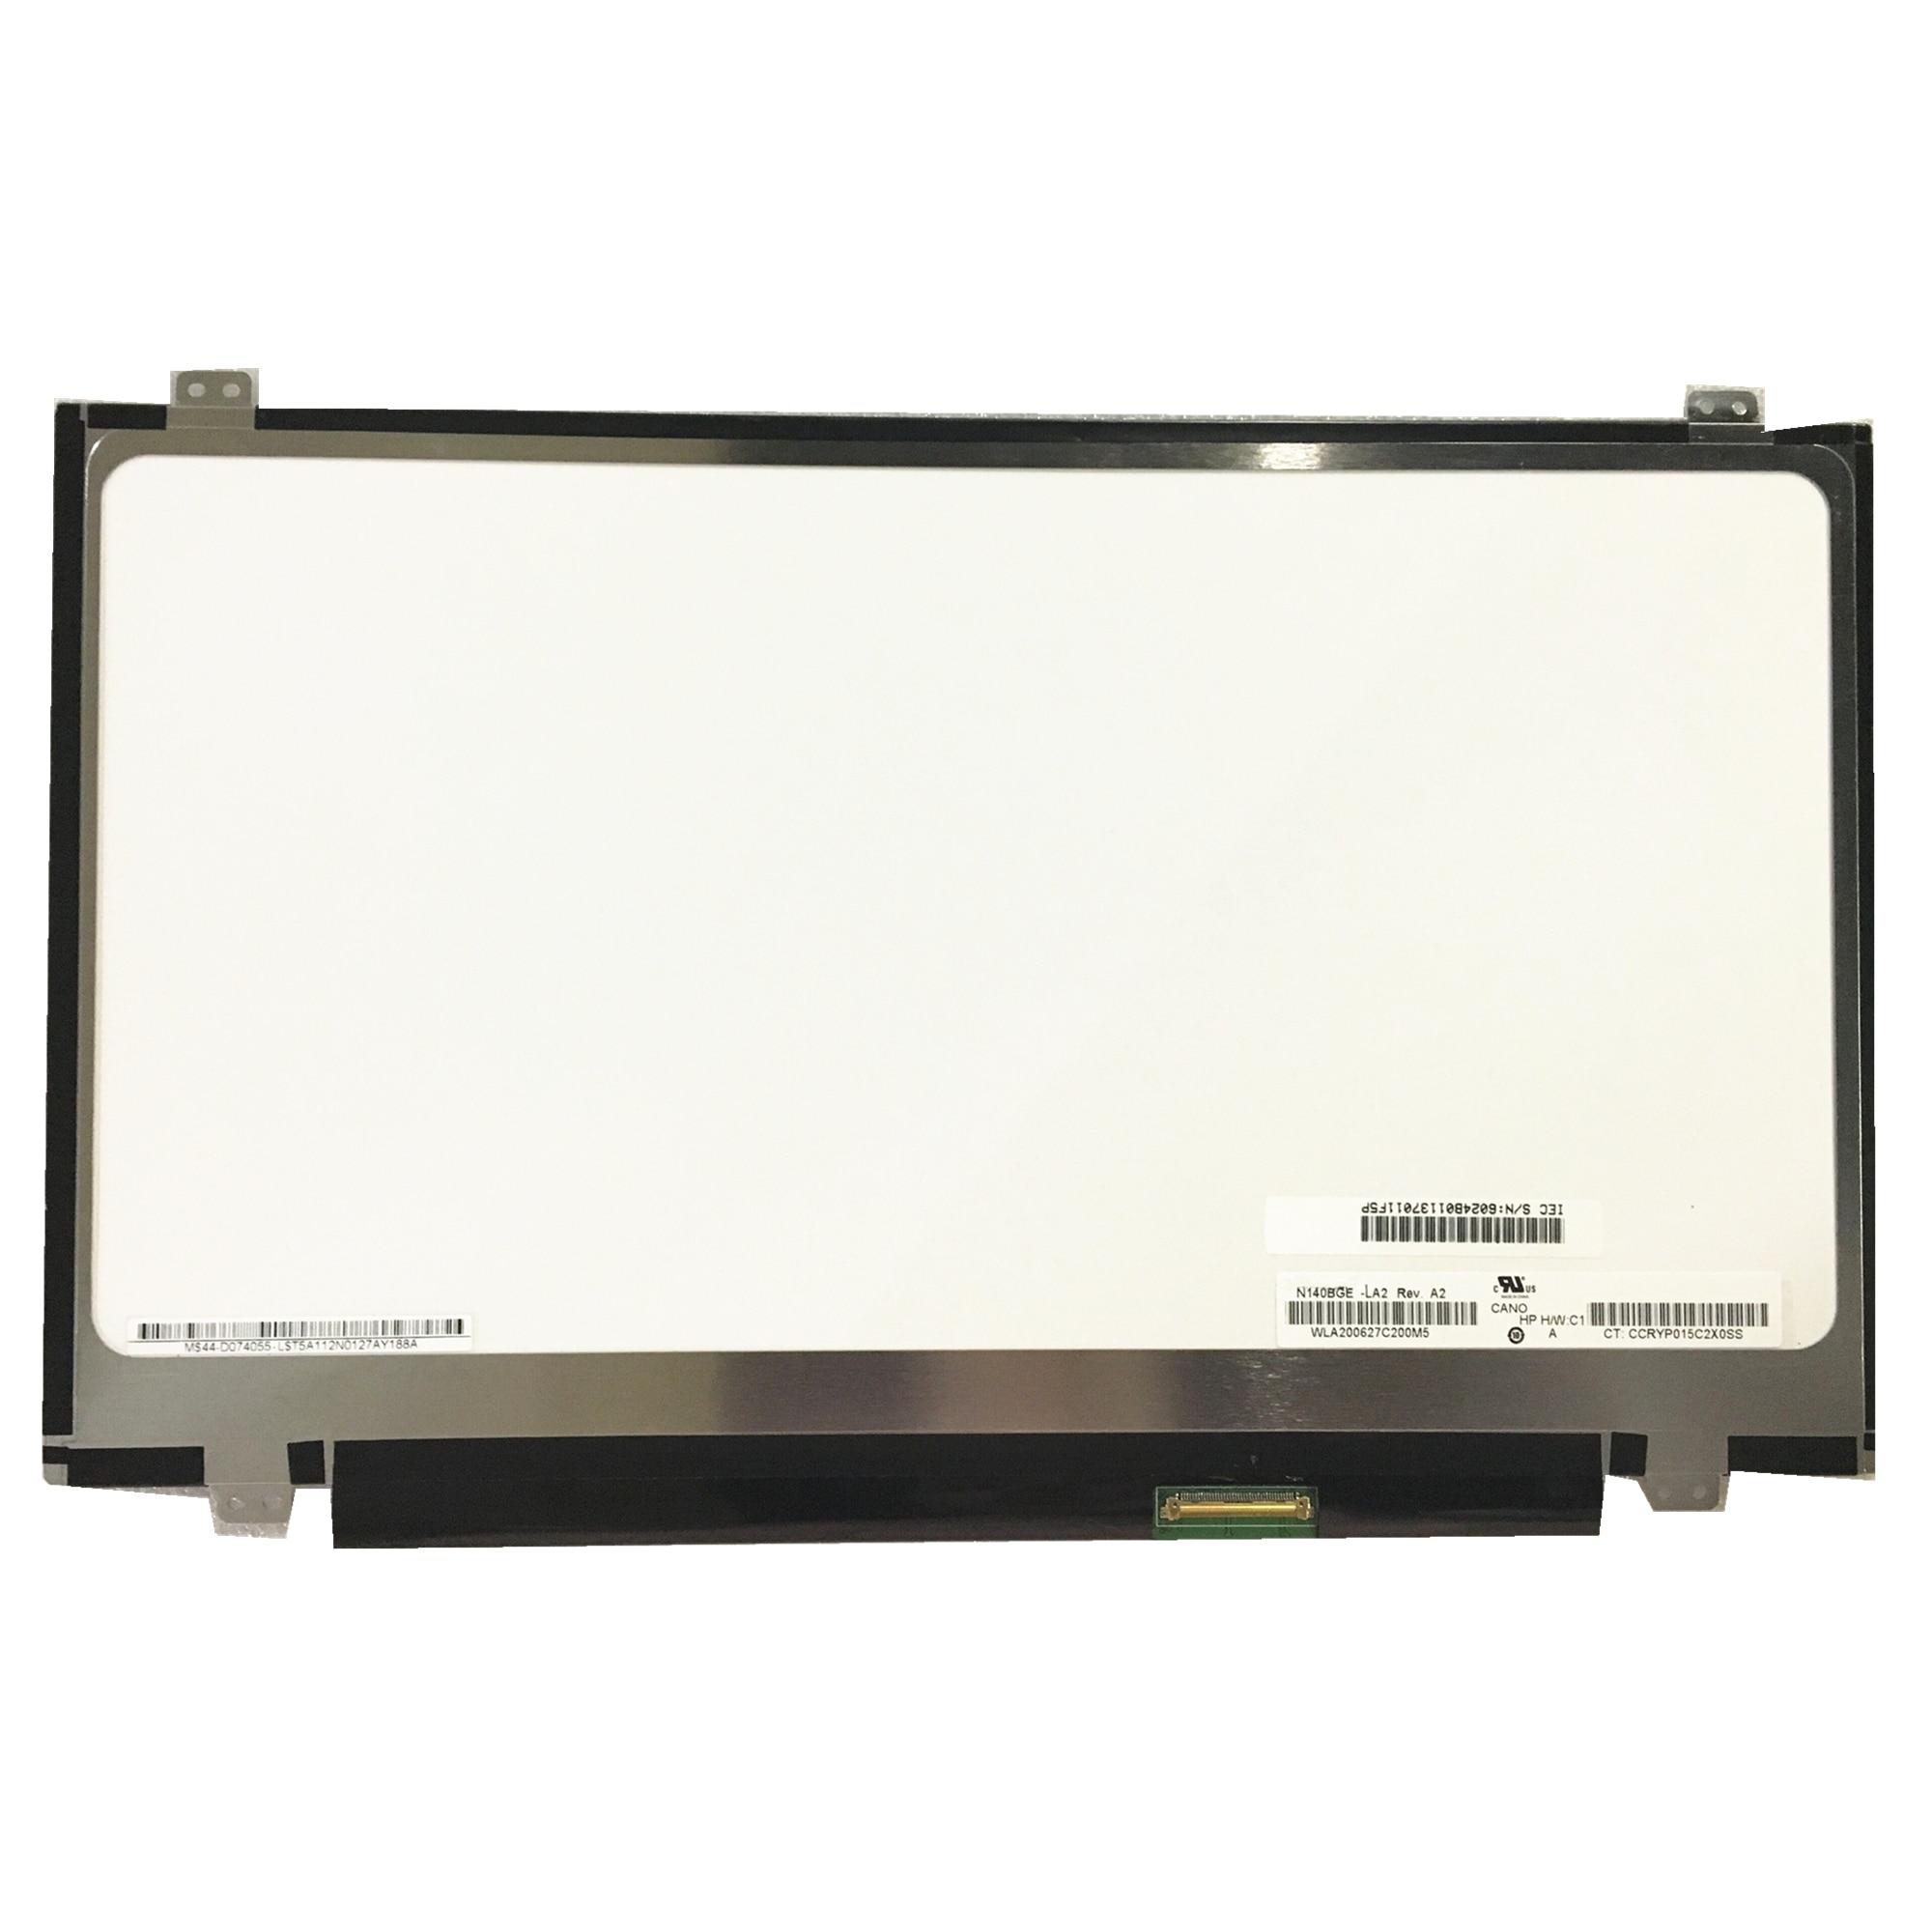 Free Shipping N140BGE-LA2 LP140WHU TLB1 N140BGE L42 L43 LP140WH2 TLA2 Laptop Lcd Screen 1366*768 LVDS 40pins